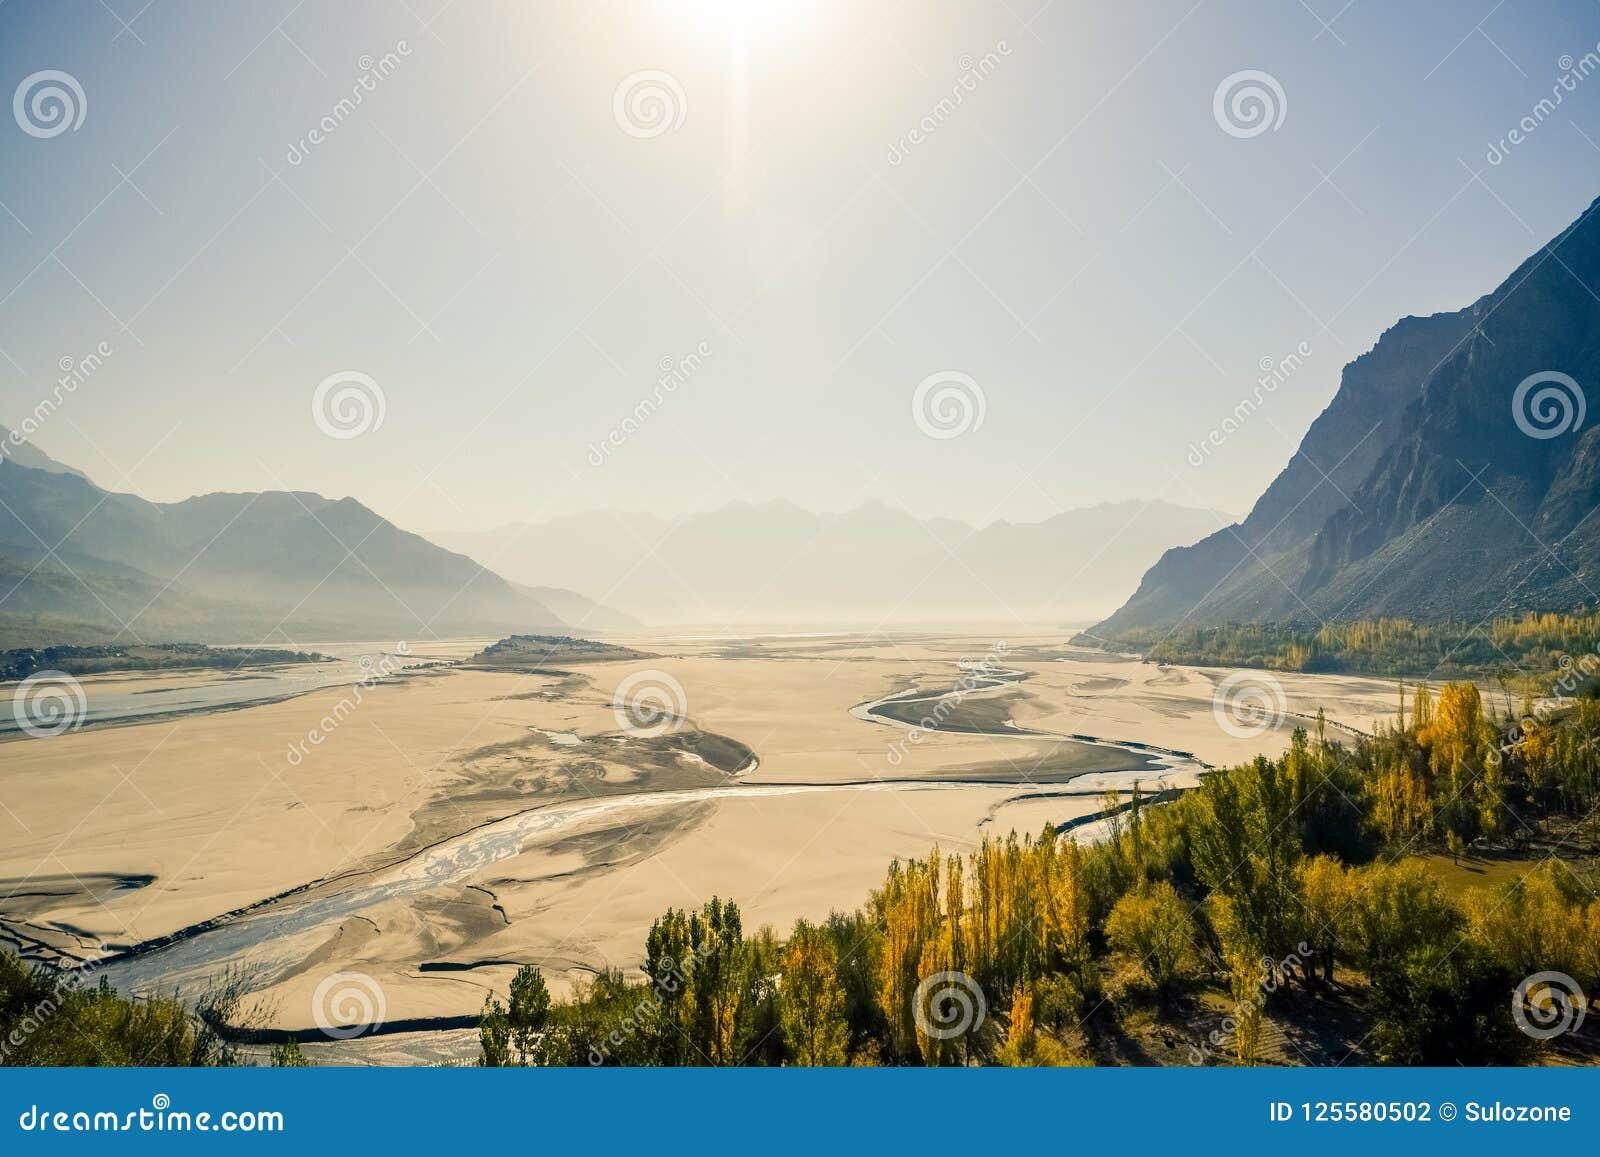 Skardu Landform  Gilgit-Baltistan, Pakistan  Stock Photo - Image of